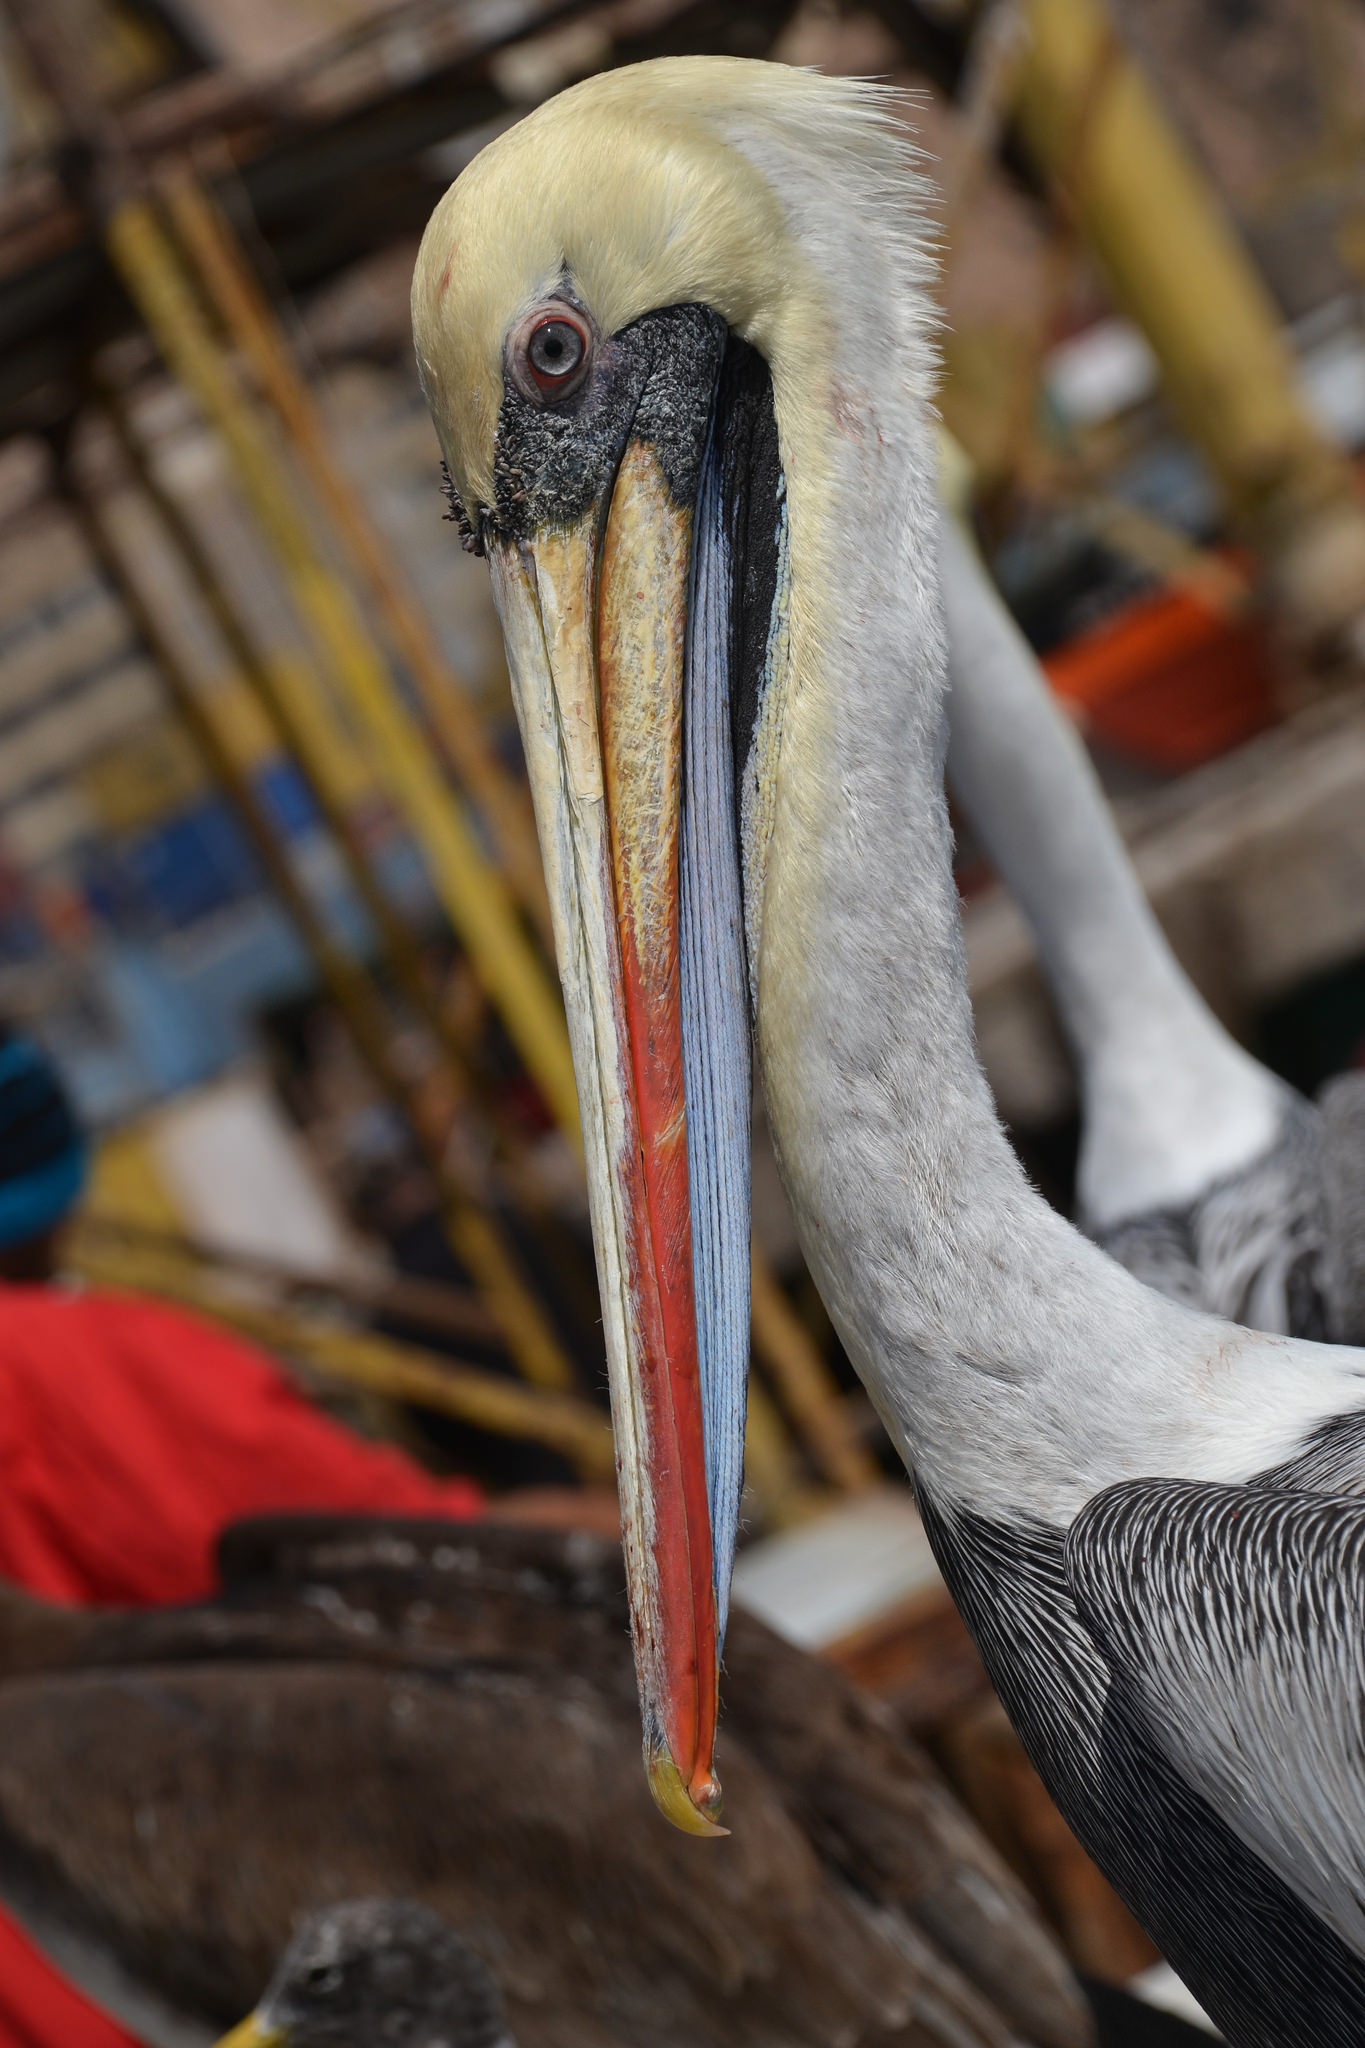 A Pelican in Chile